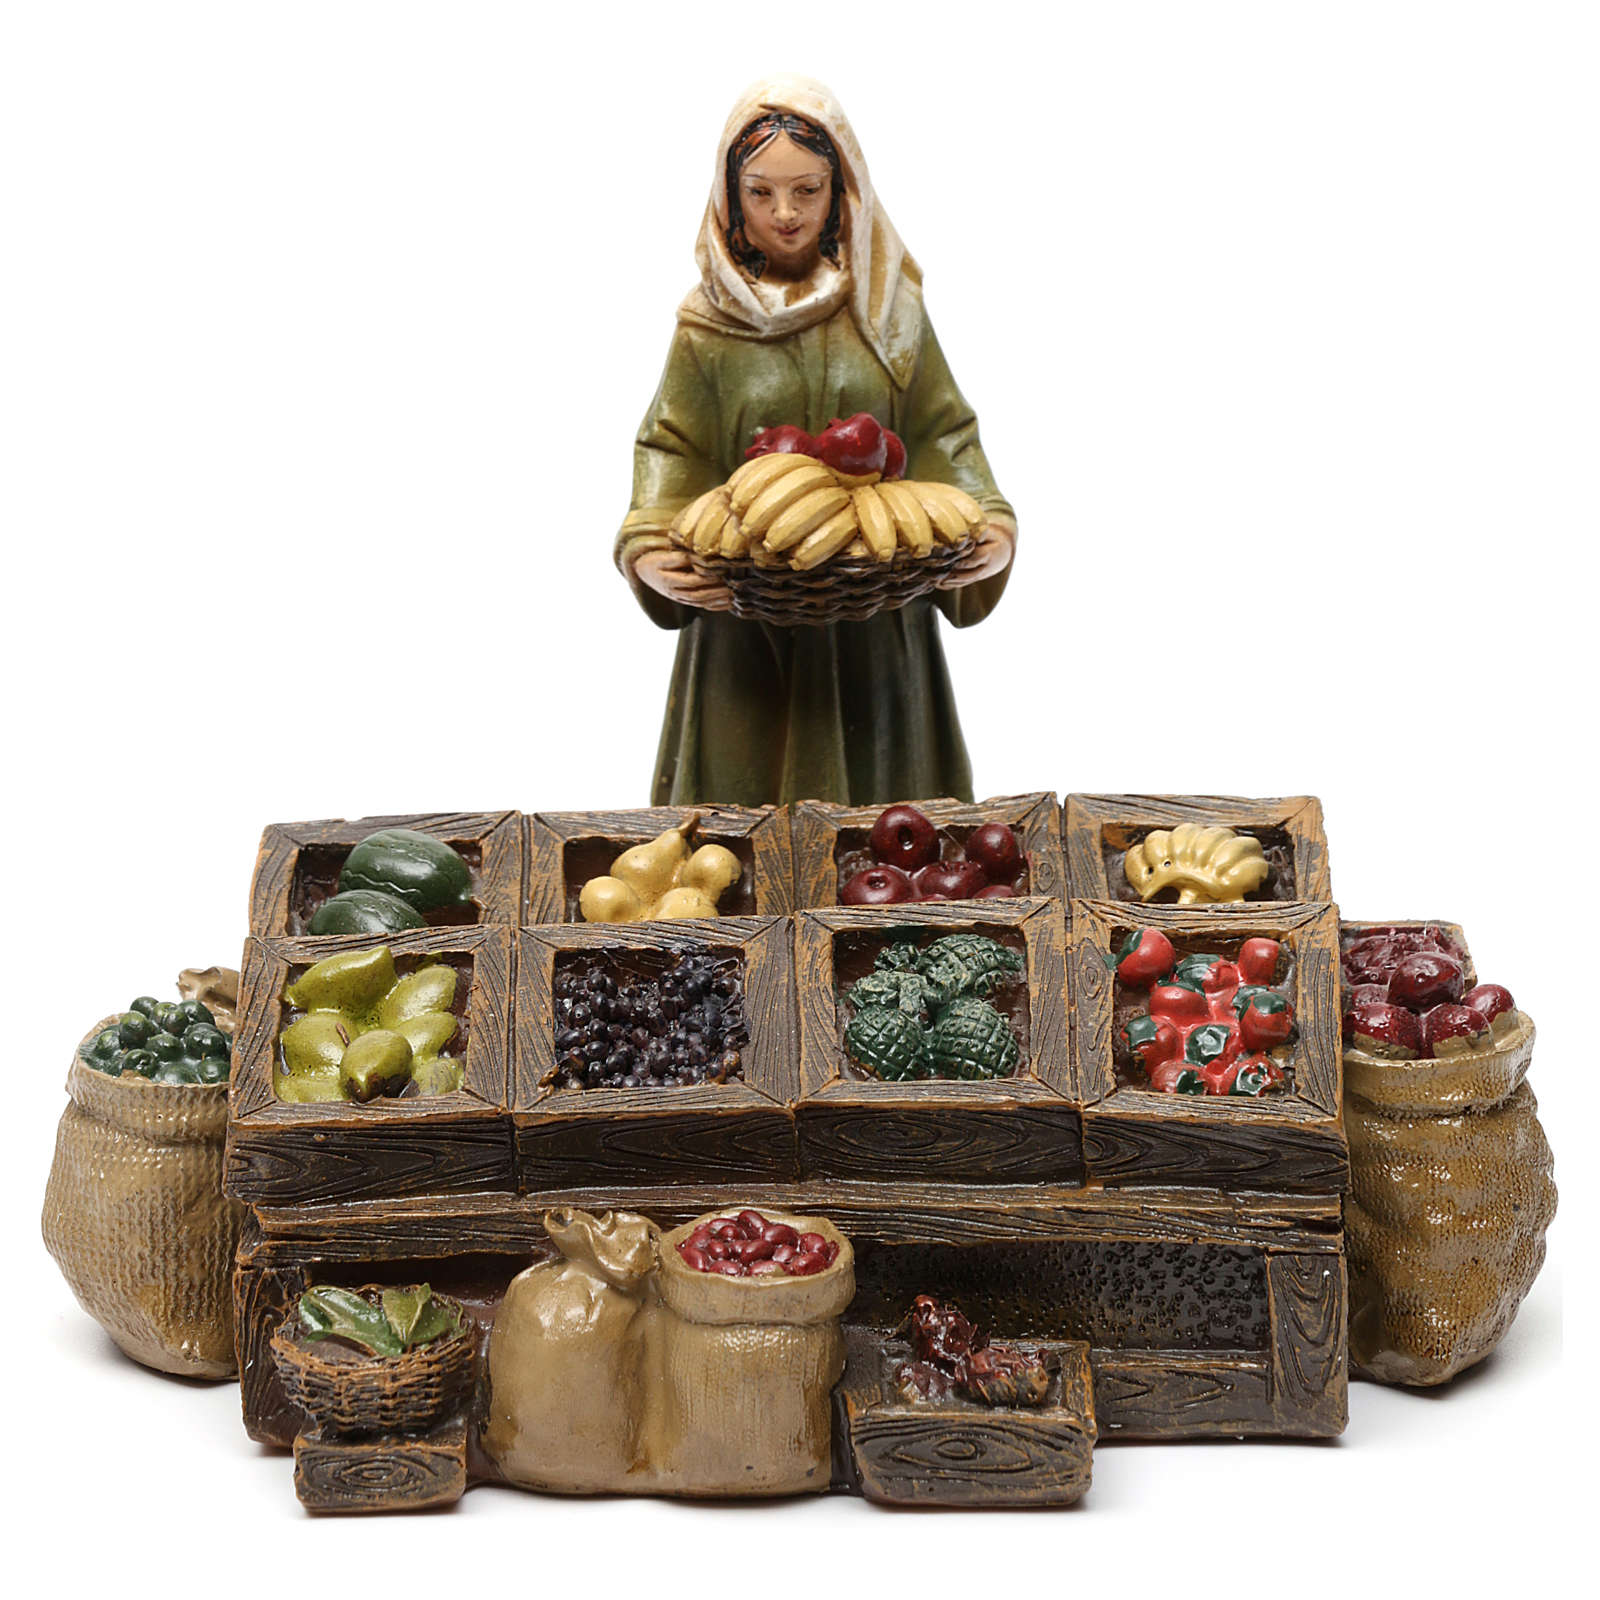 Verduleros con mostrador fruta de resina 3 piezas para belén de 13 cm de altura media 3